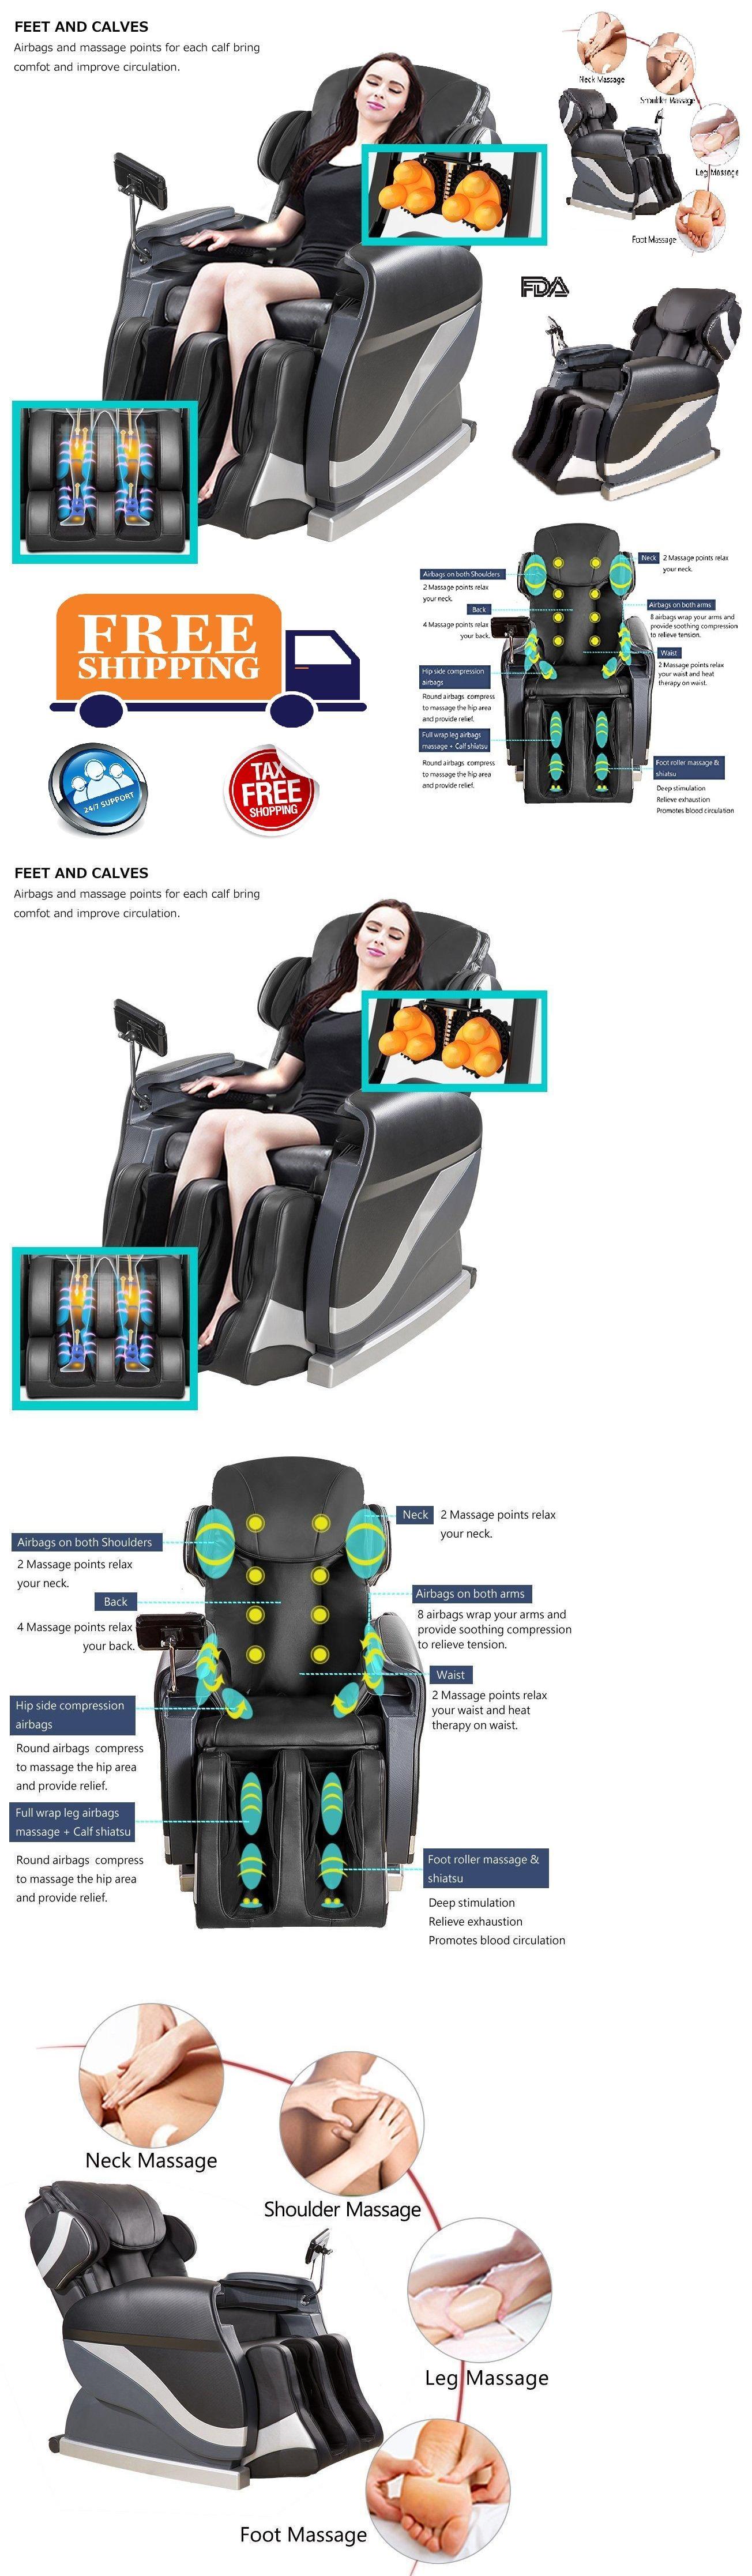 Electric Massage Chairs Electric Full Body Shiatsu Massage Chair